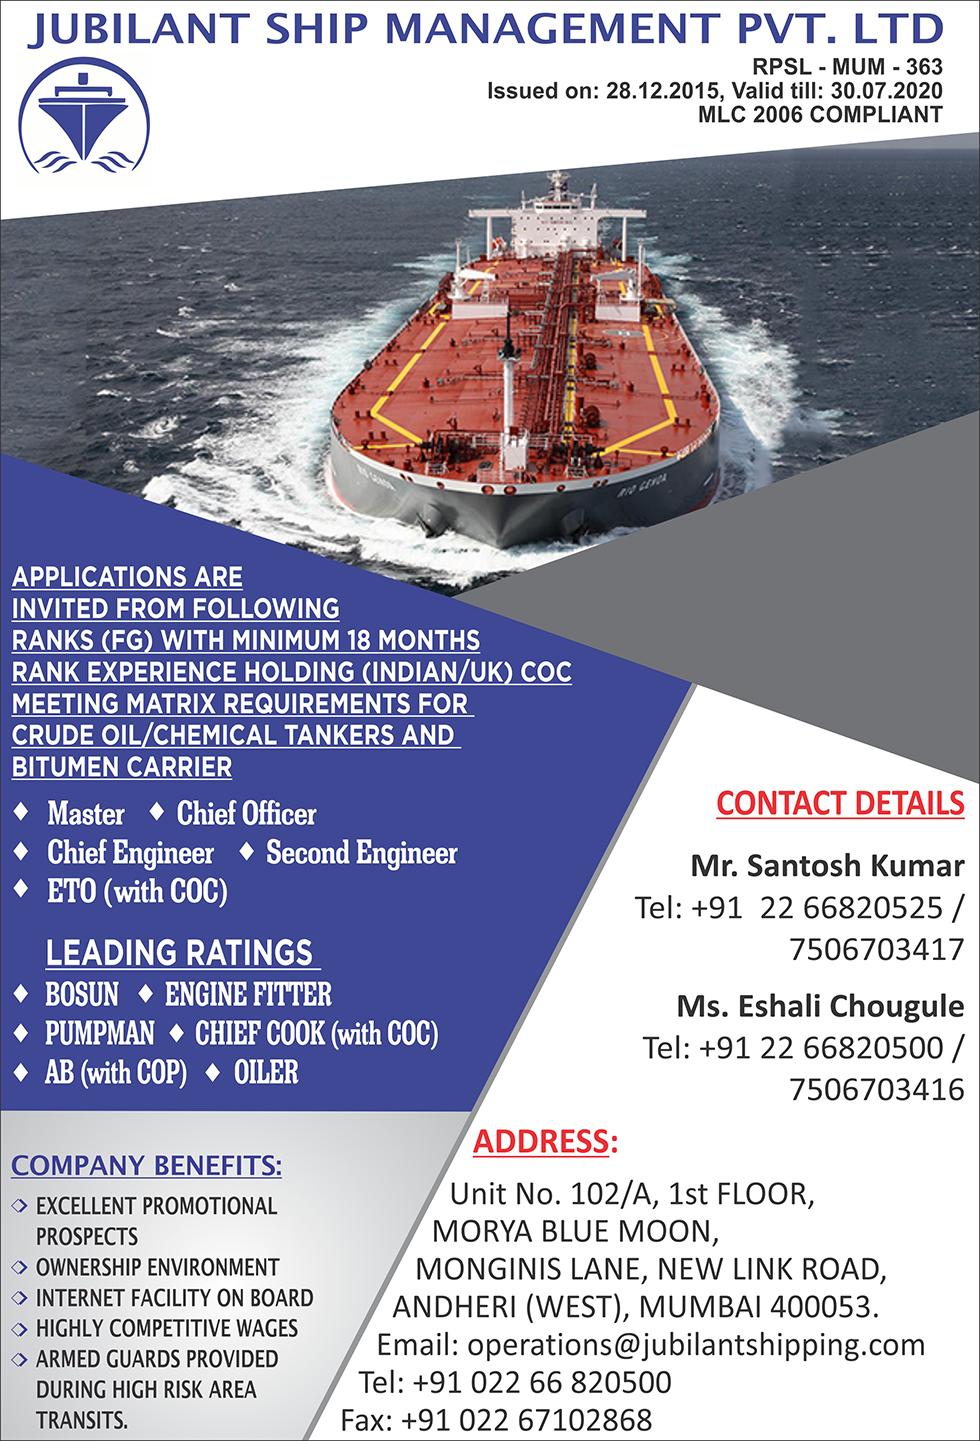 Jubilant Ship Management   Seajob Link   Sea Career